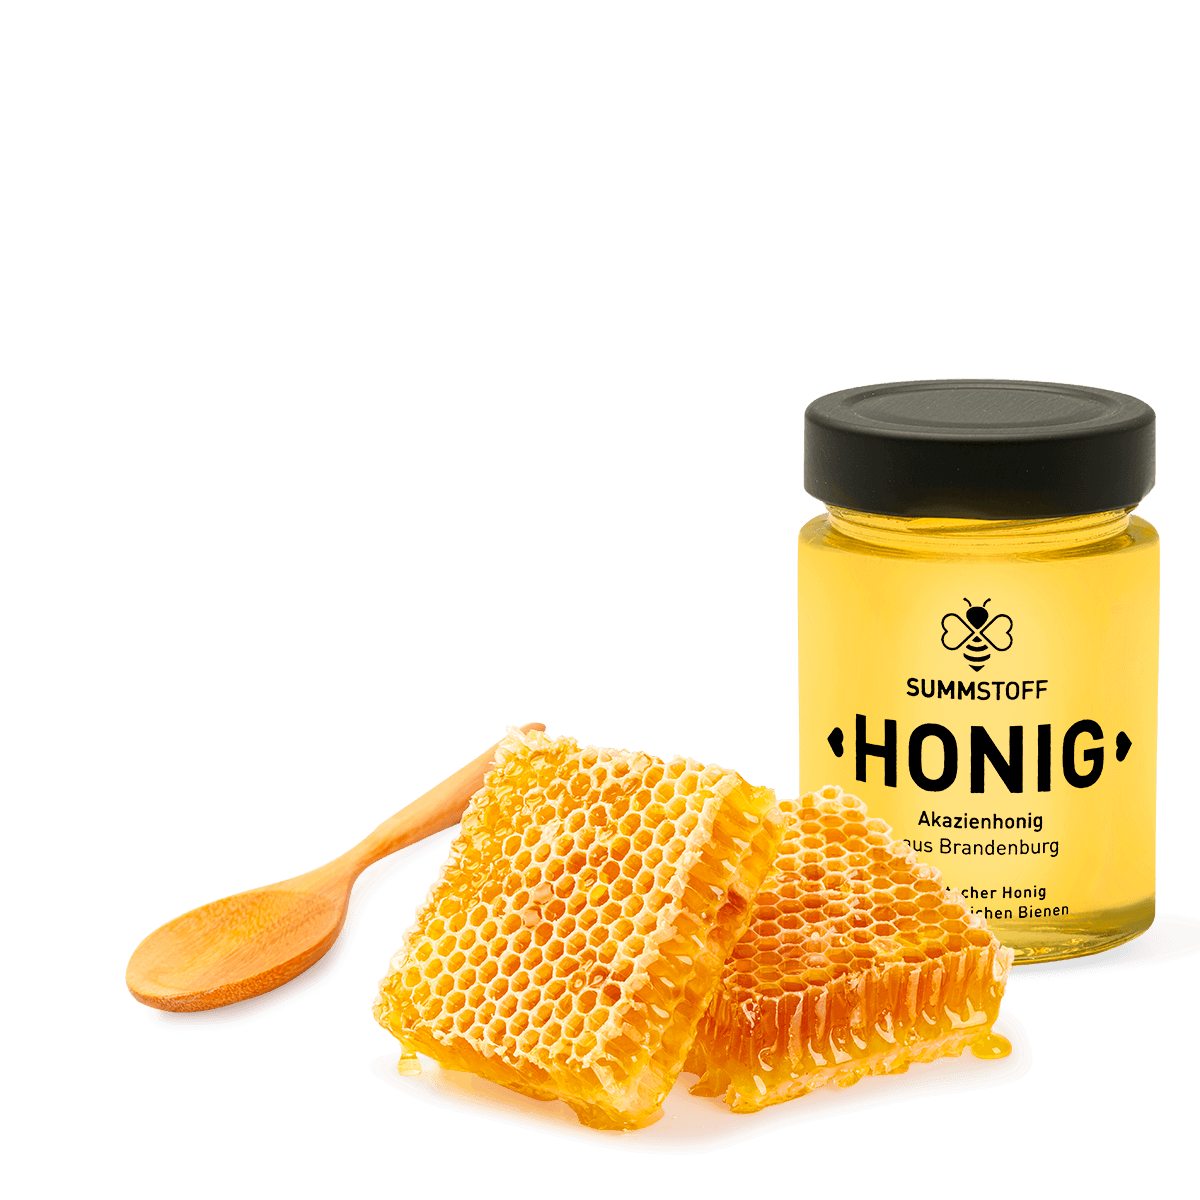 leckerer SUMMSTOFF Honig